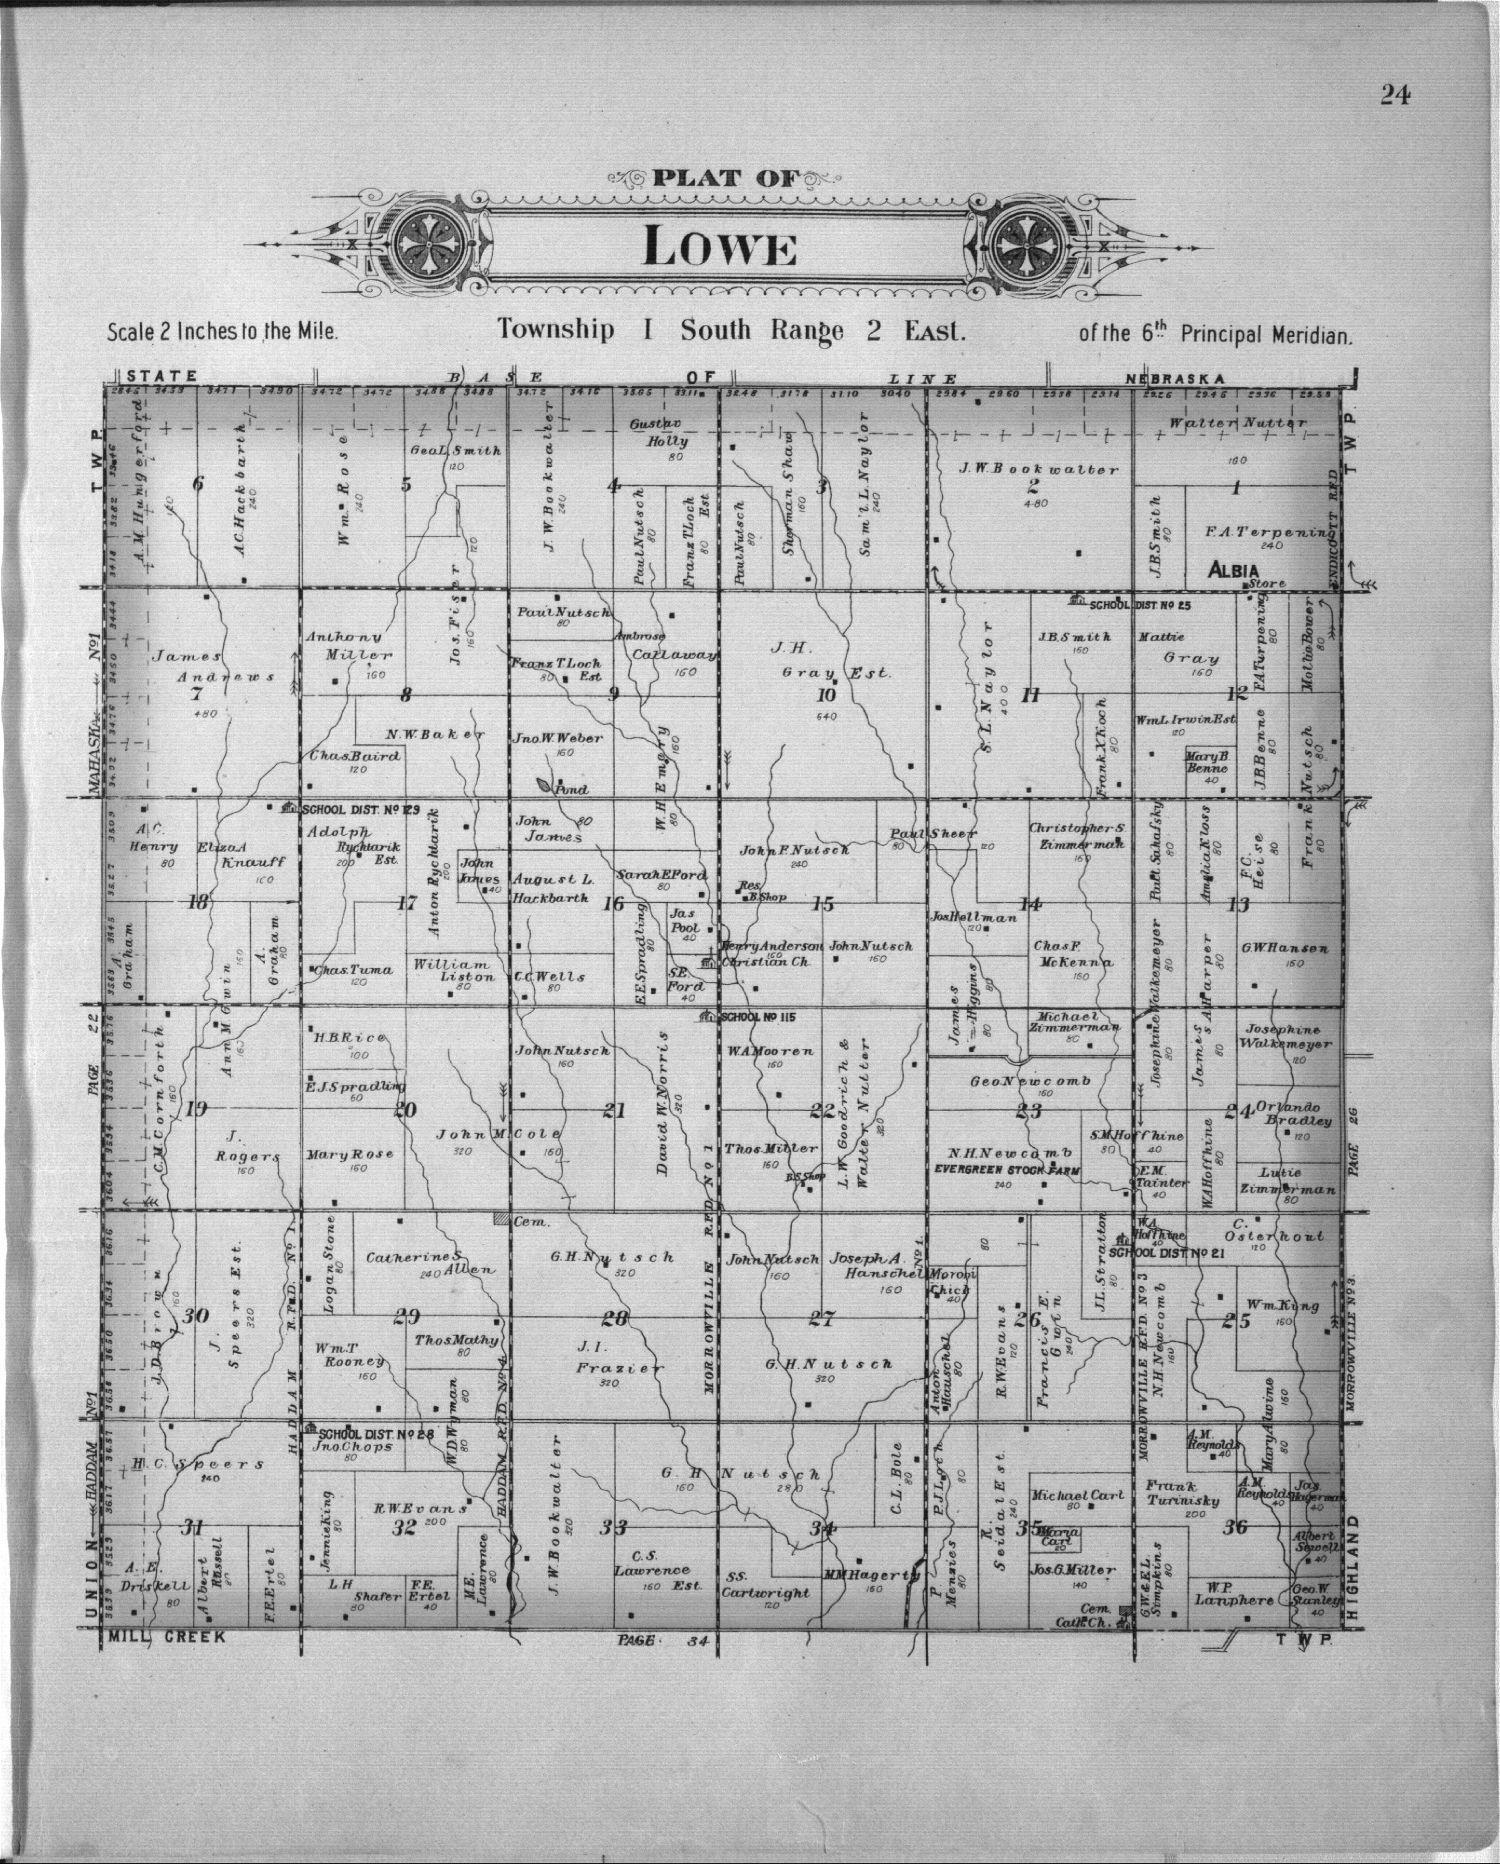 Plat book of Washington County, Kansas - 24